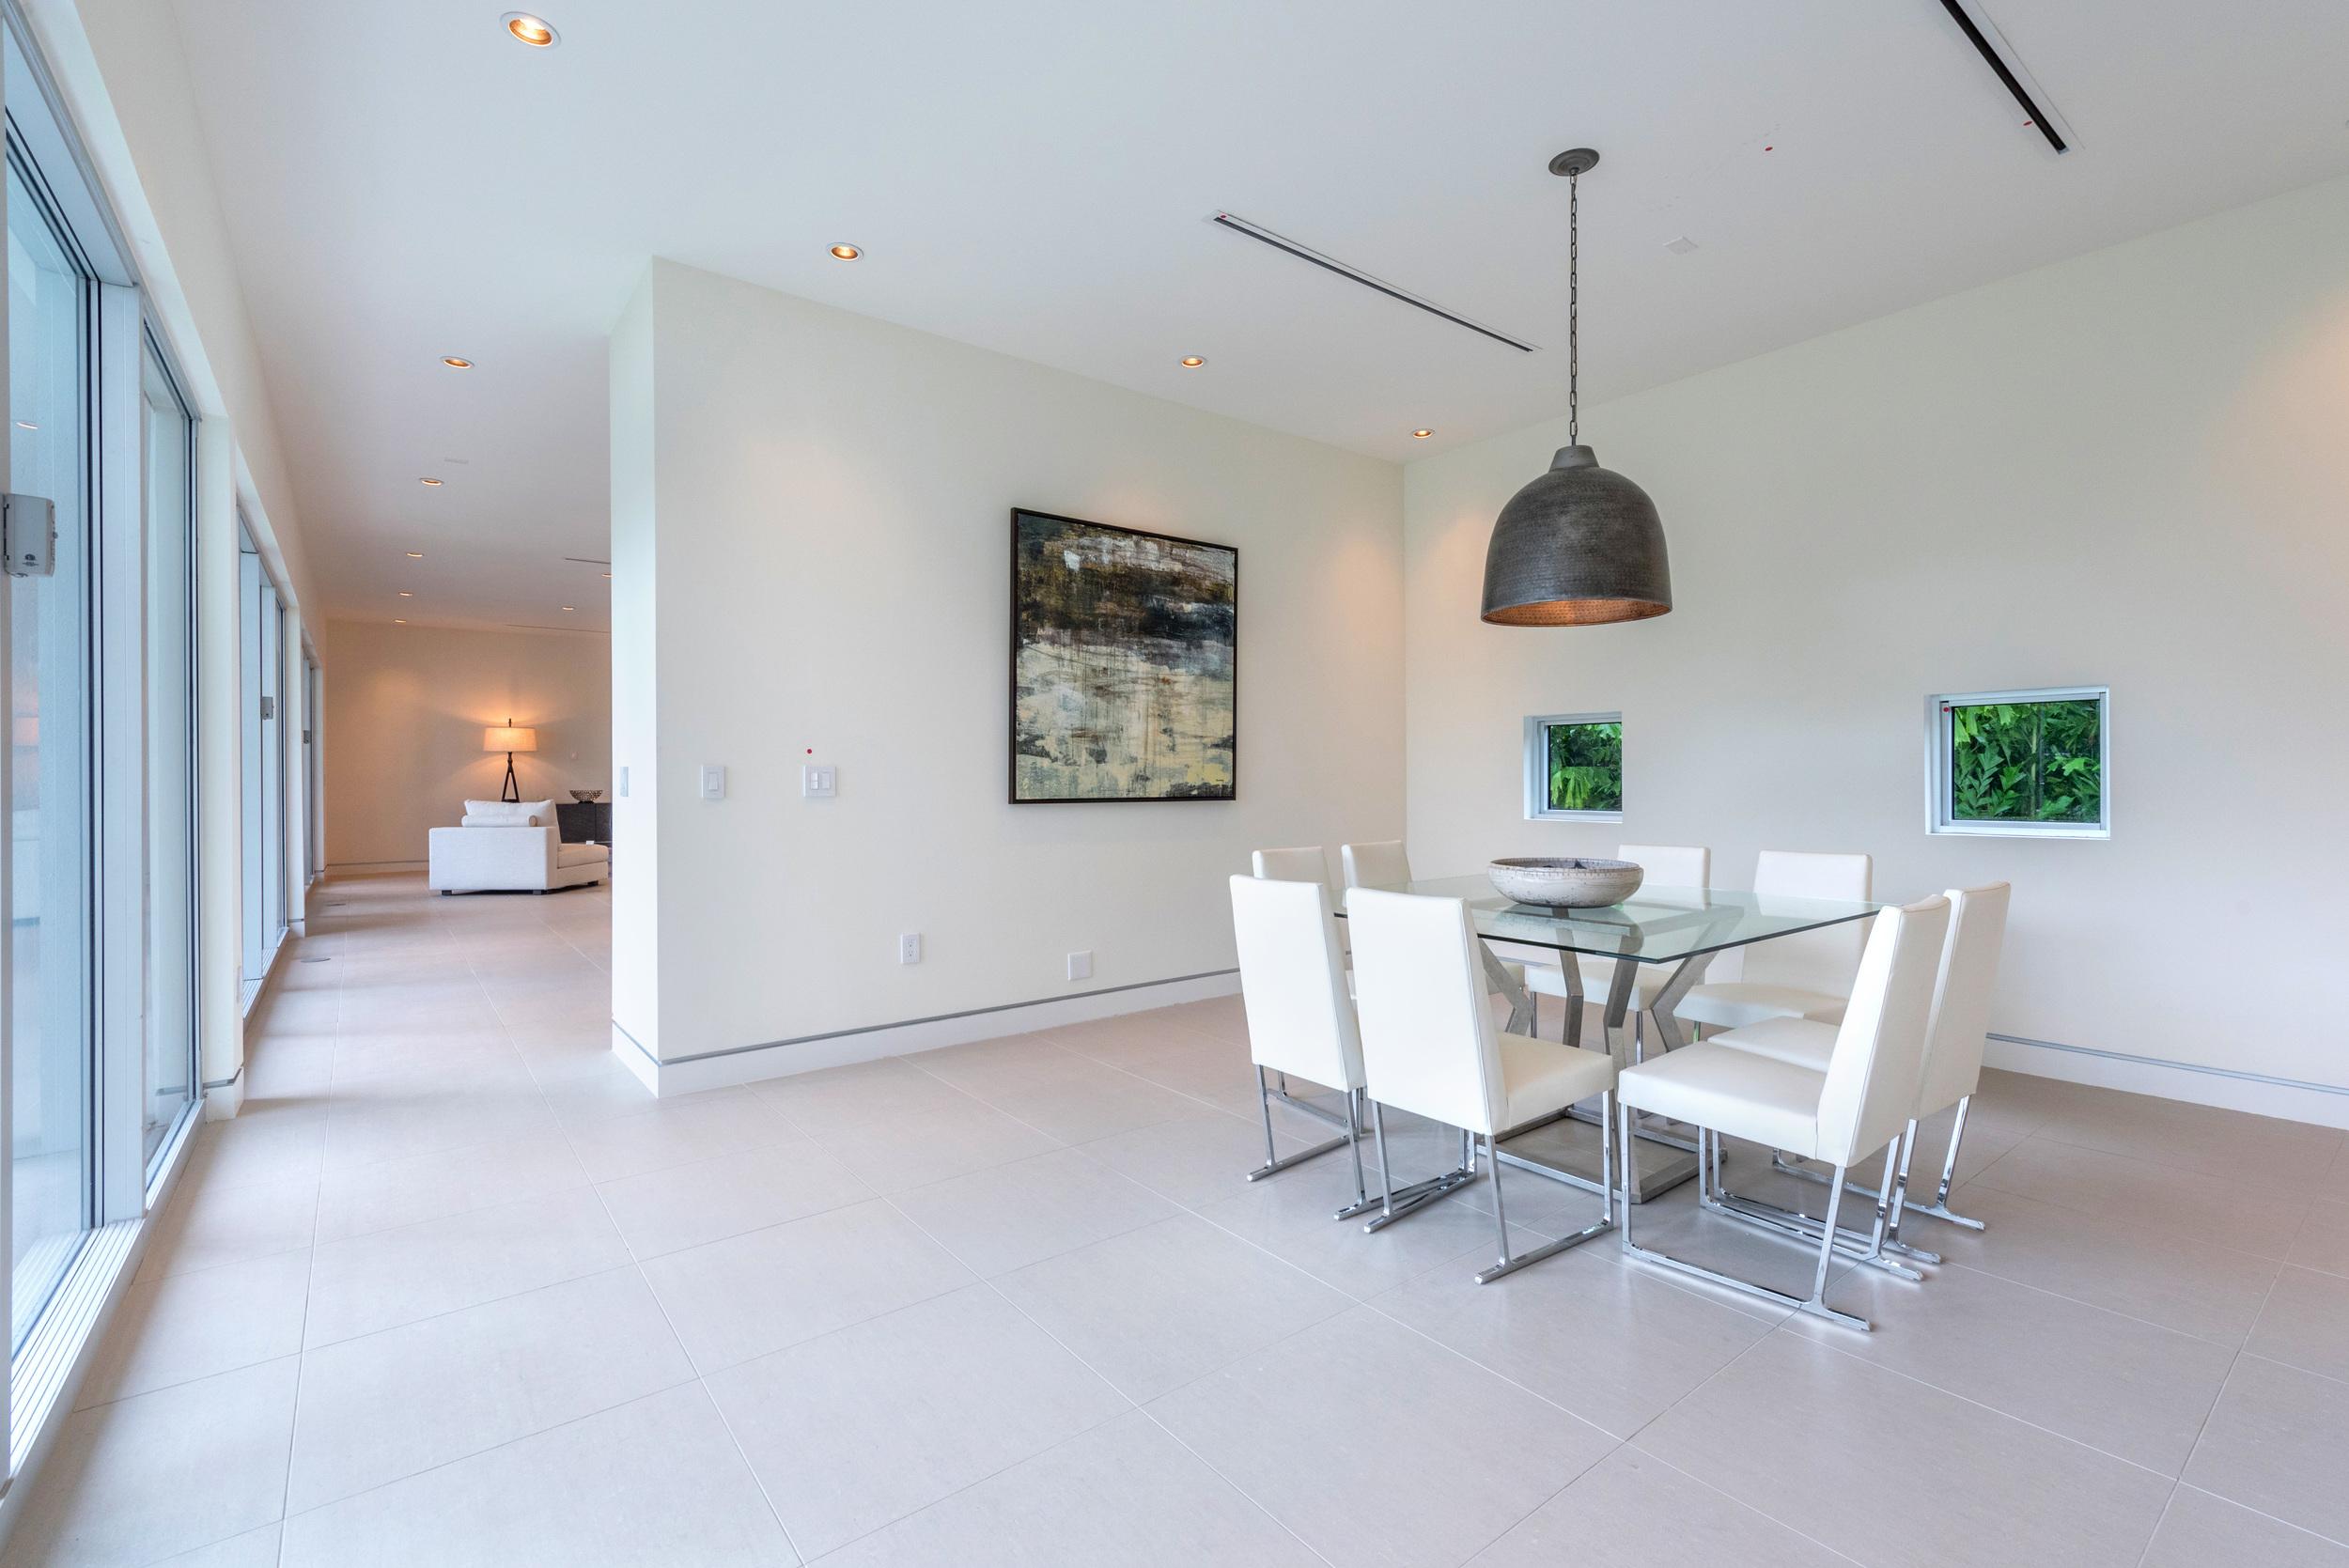 The Setting Homes Plum House Miami Florida Interior Dining Room TARIS Real Estate